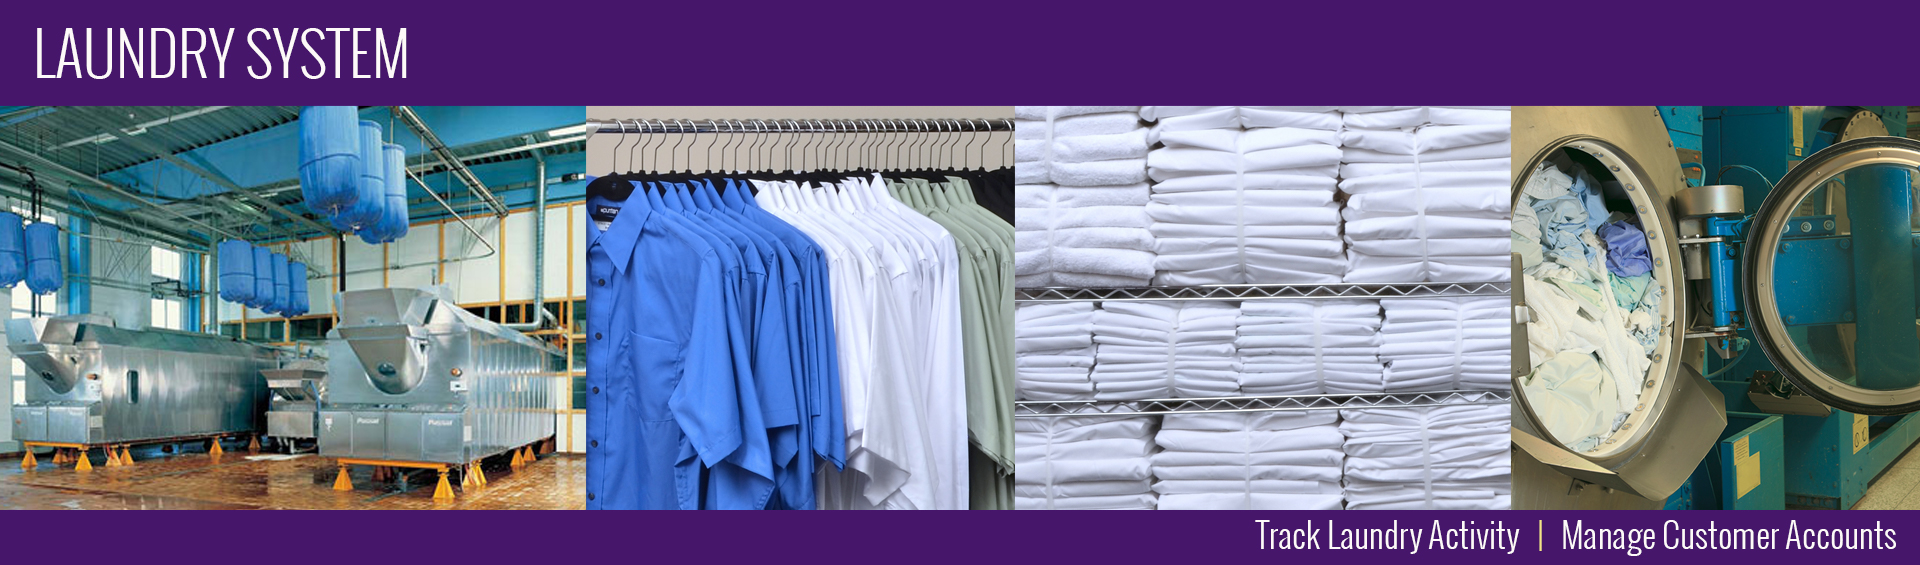 Laundry System